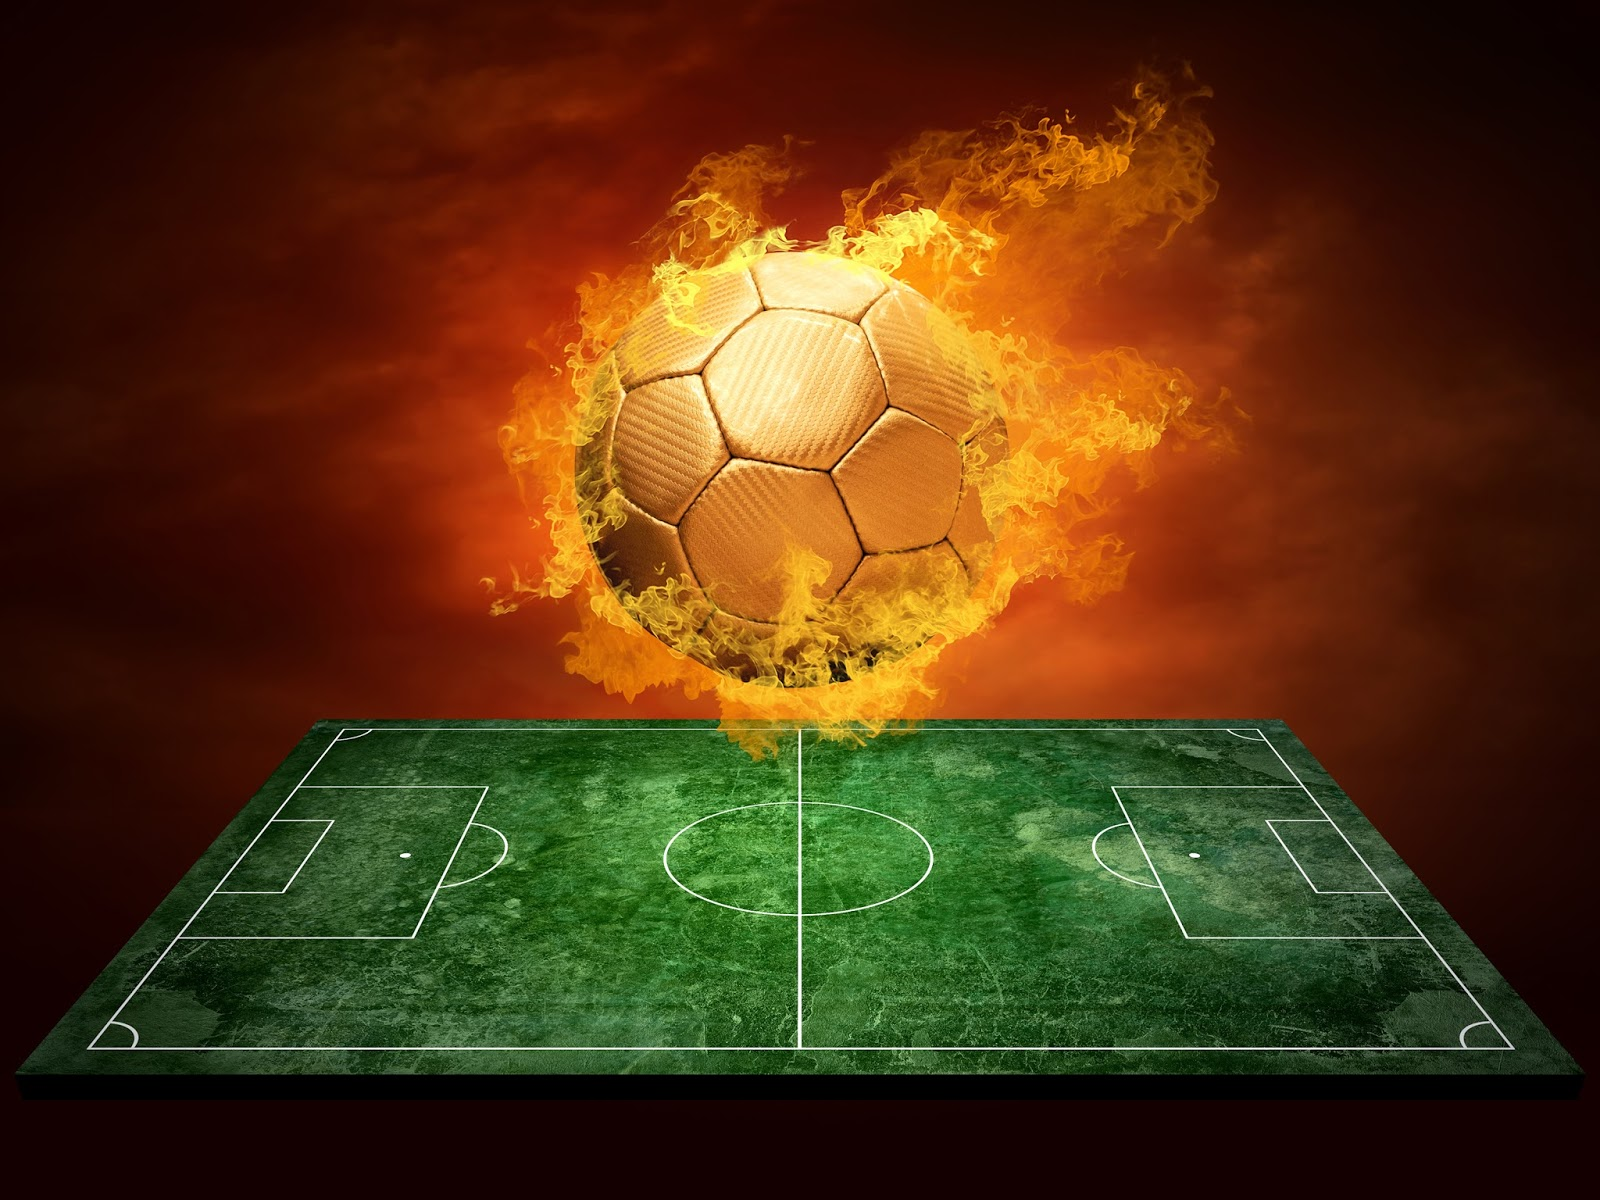 Soccer Field Wallpaper - WallpaperSafari